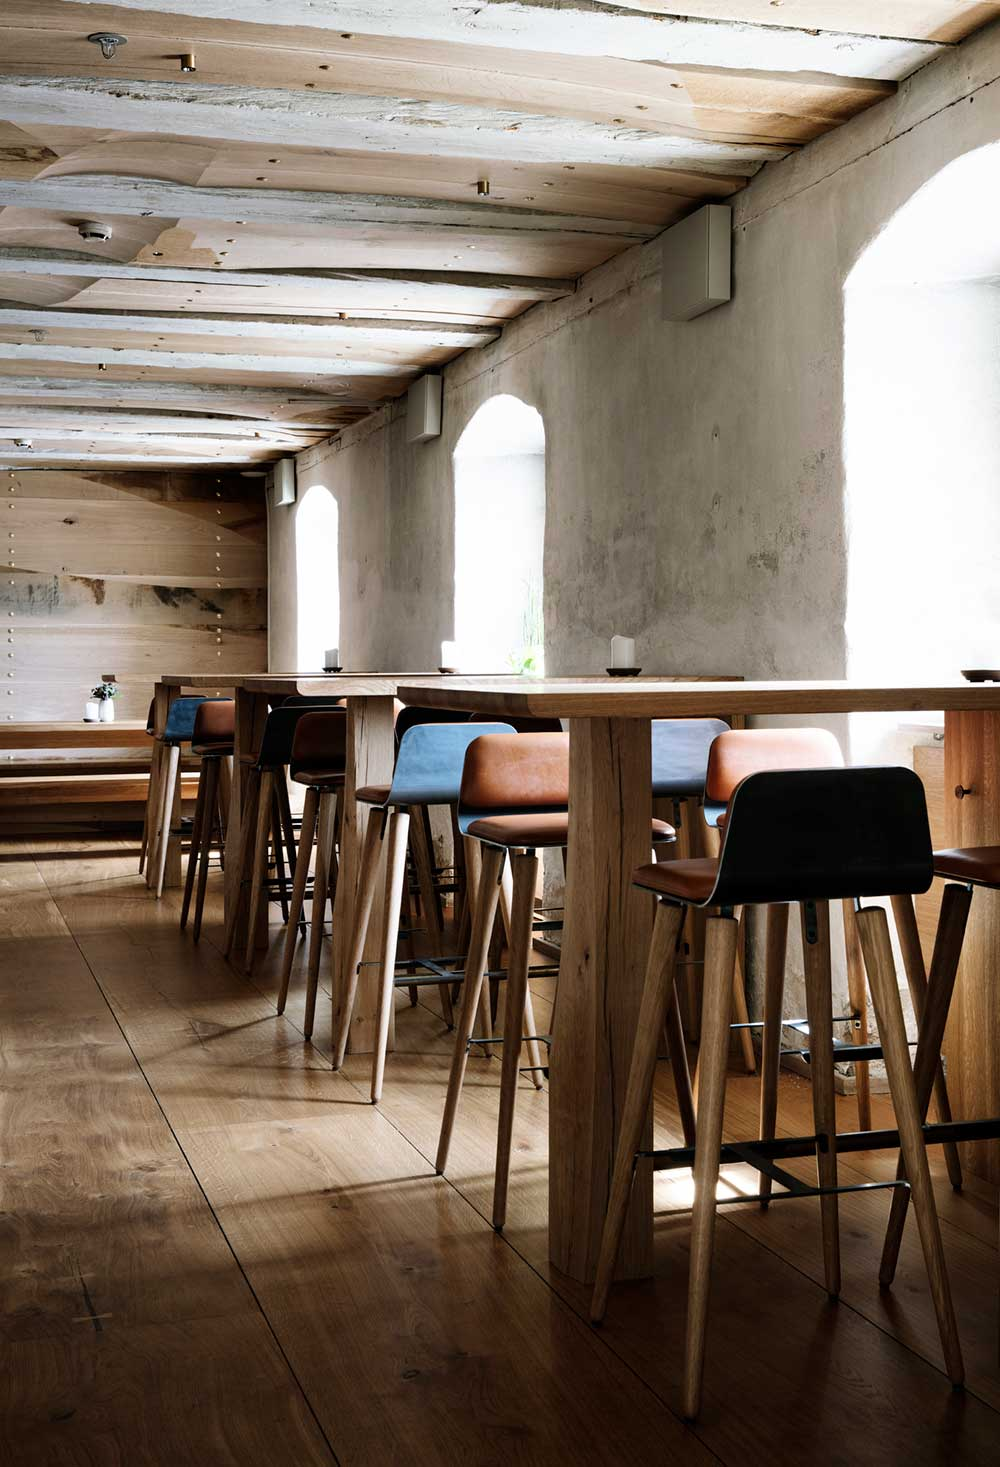 restaurant bar sitting design barr - Barr Interior Design